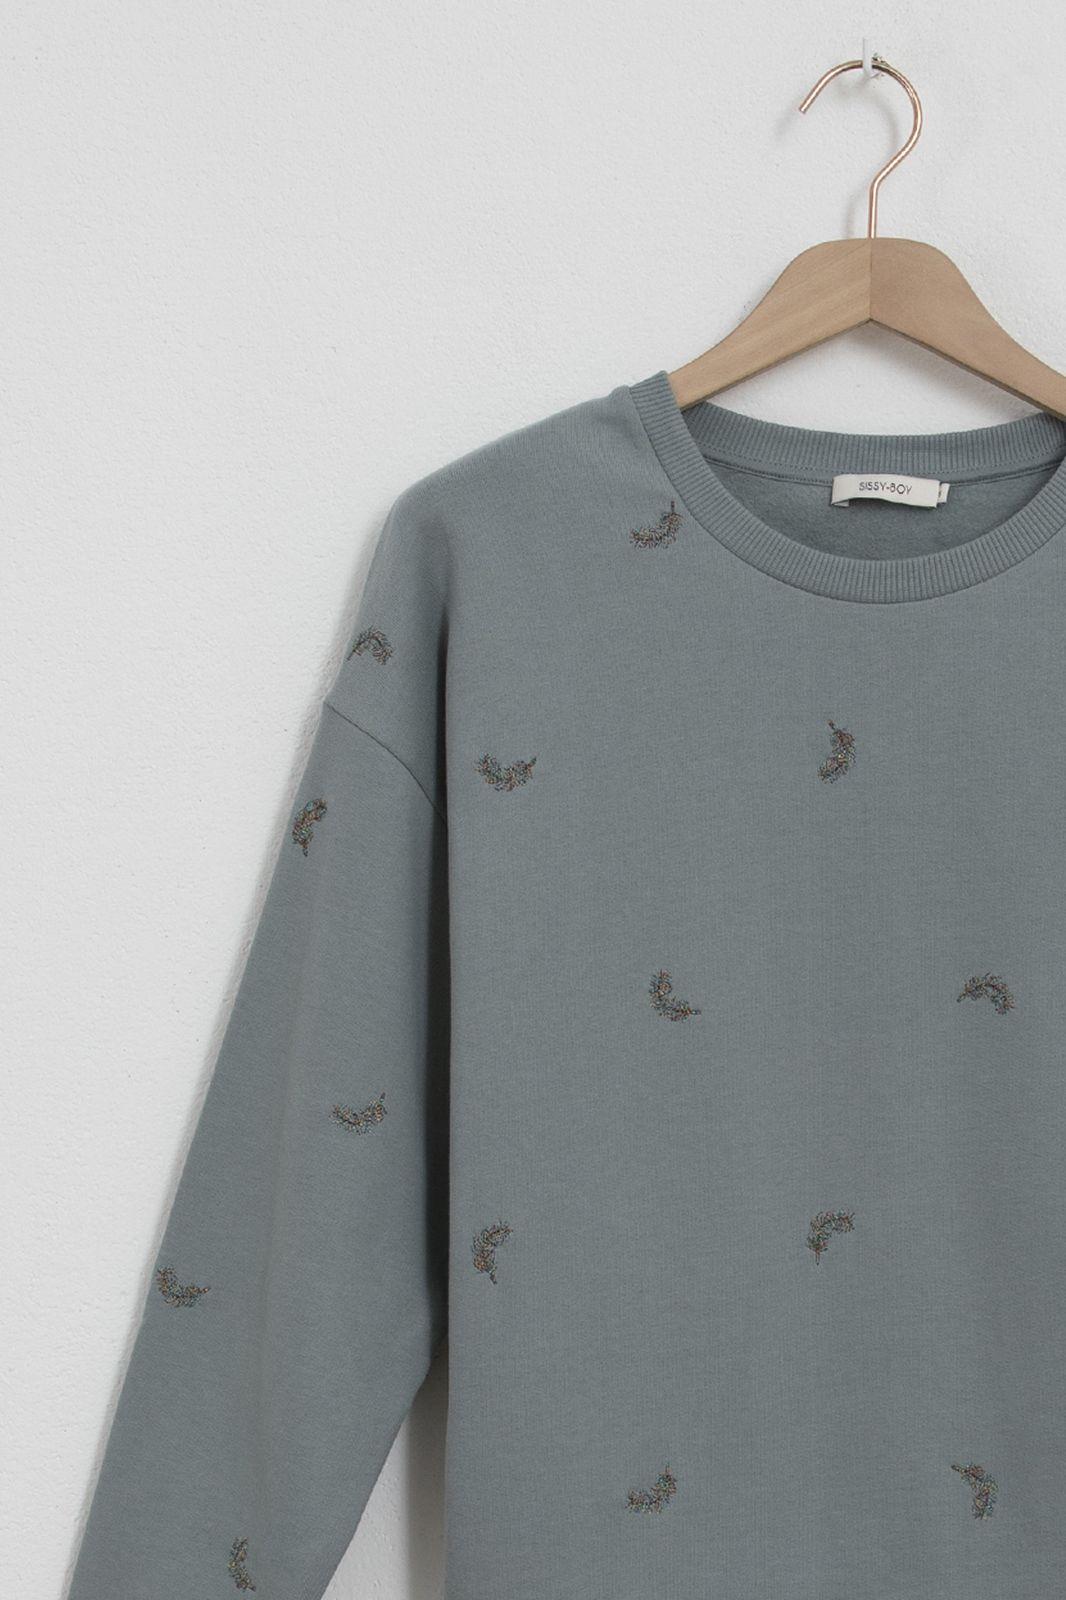 Blauwe sweater met all over veren embroidery en lurex - Dames | Sissy-Boy